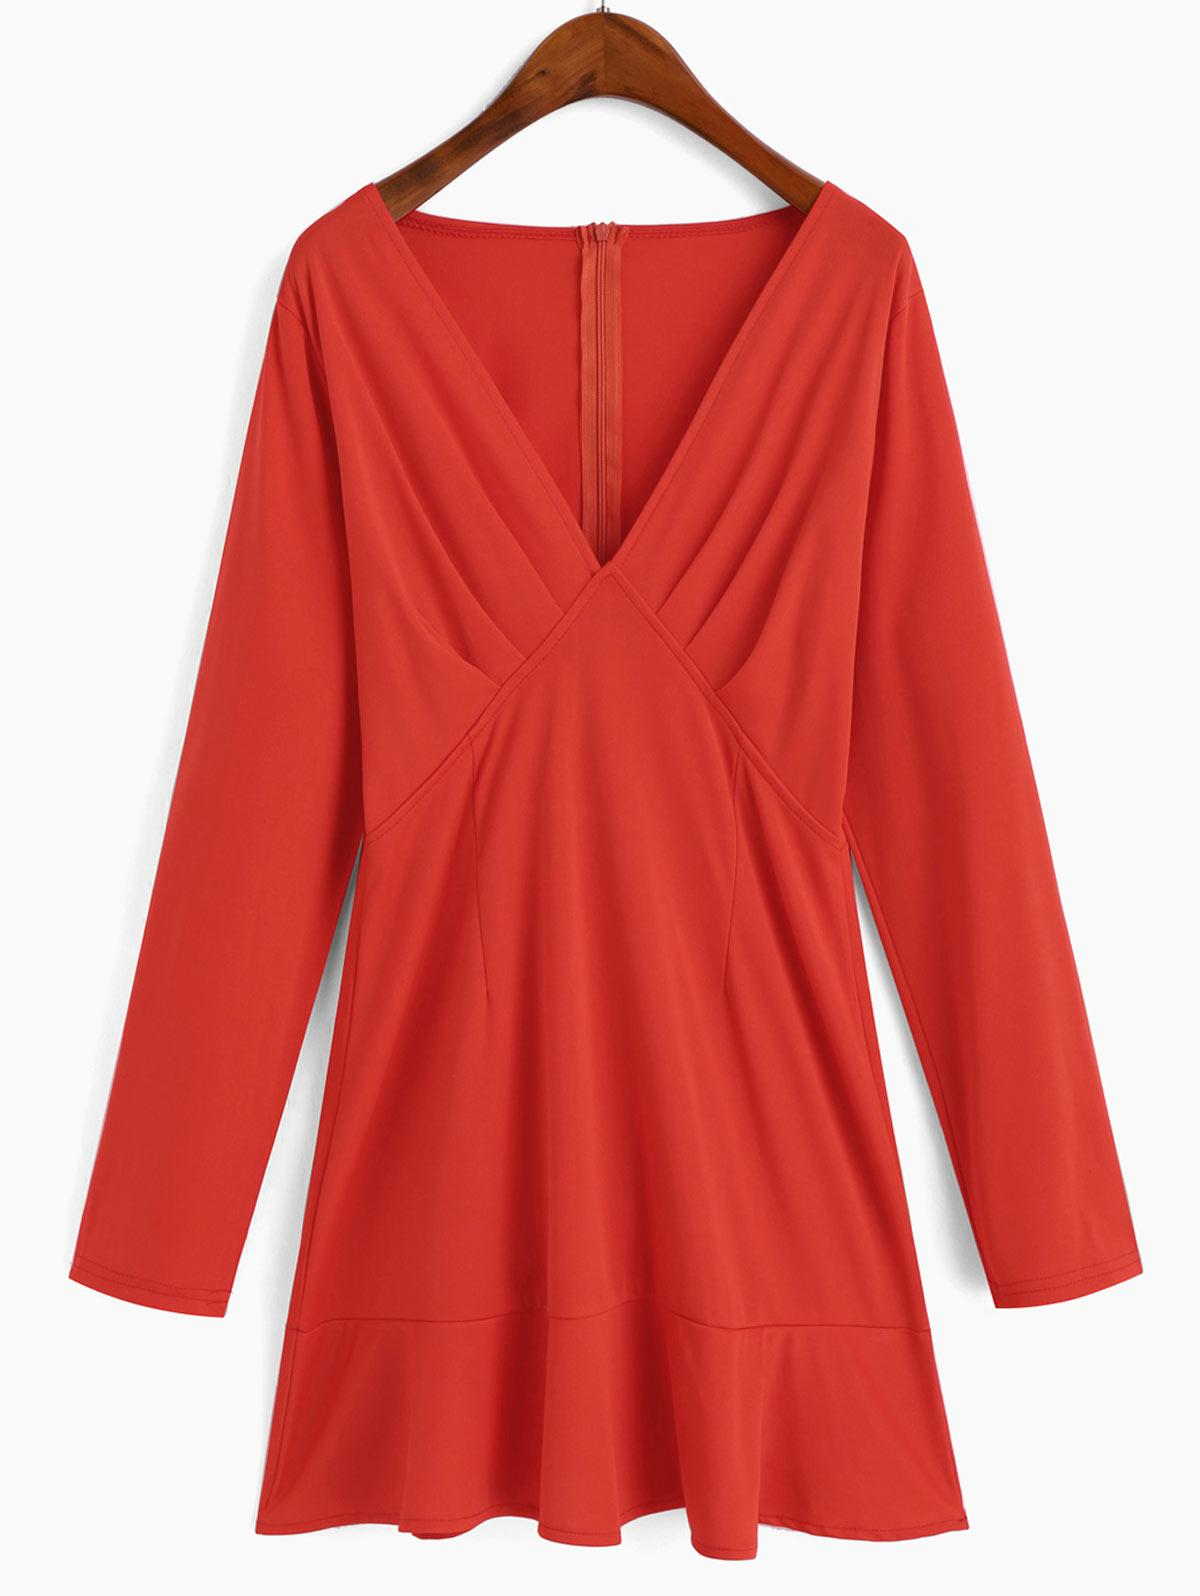 Plunging Neck Long Sleeve Mini Ruffled Hem Dress